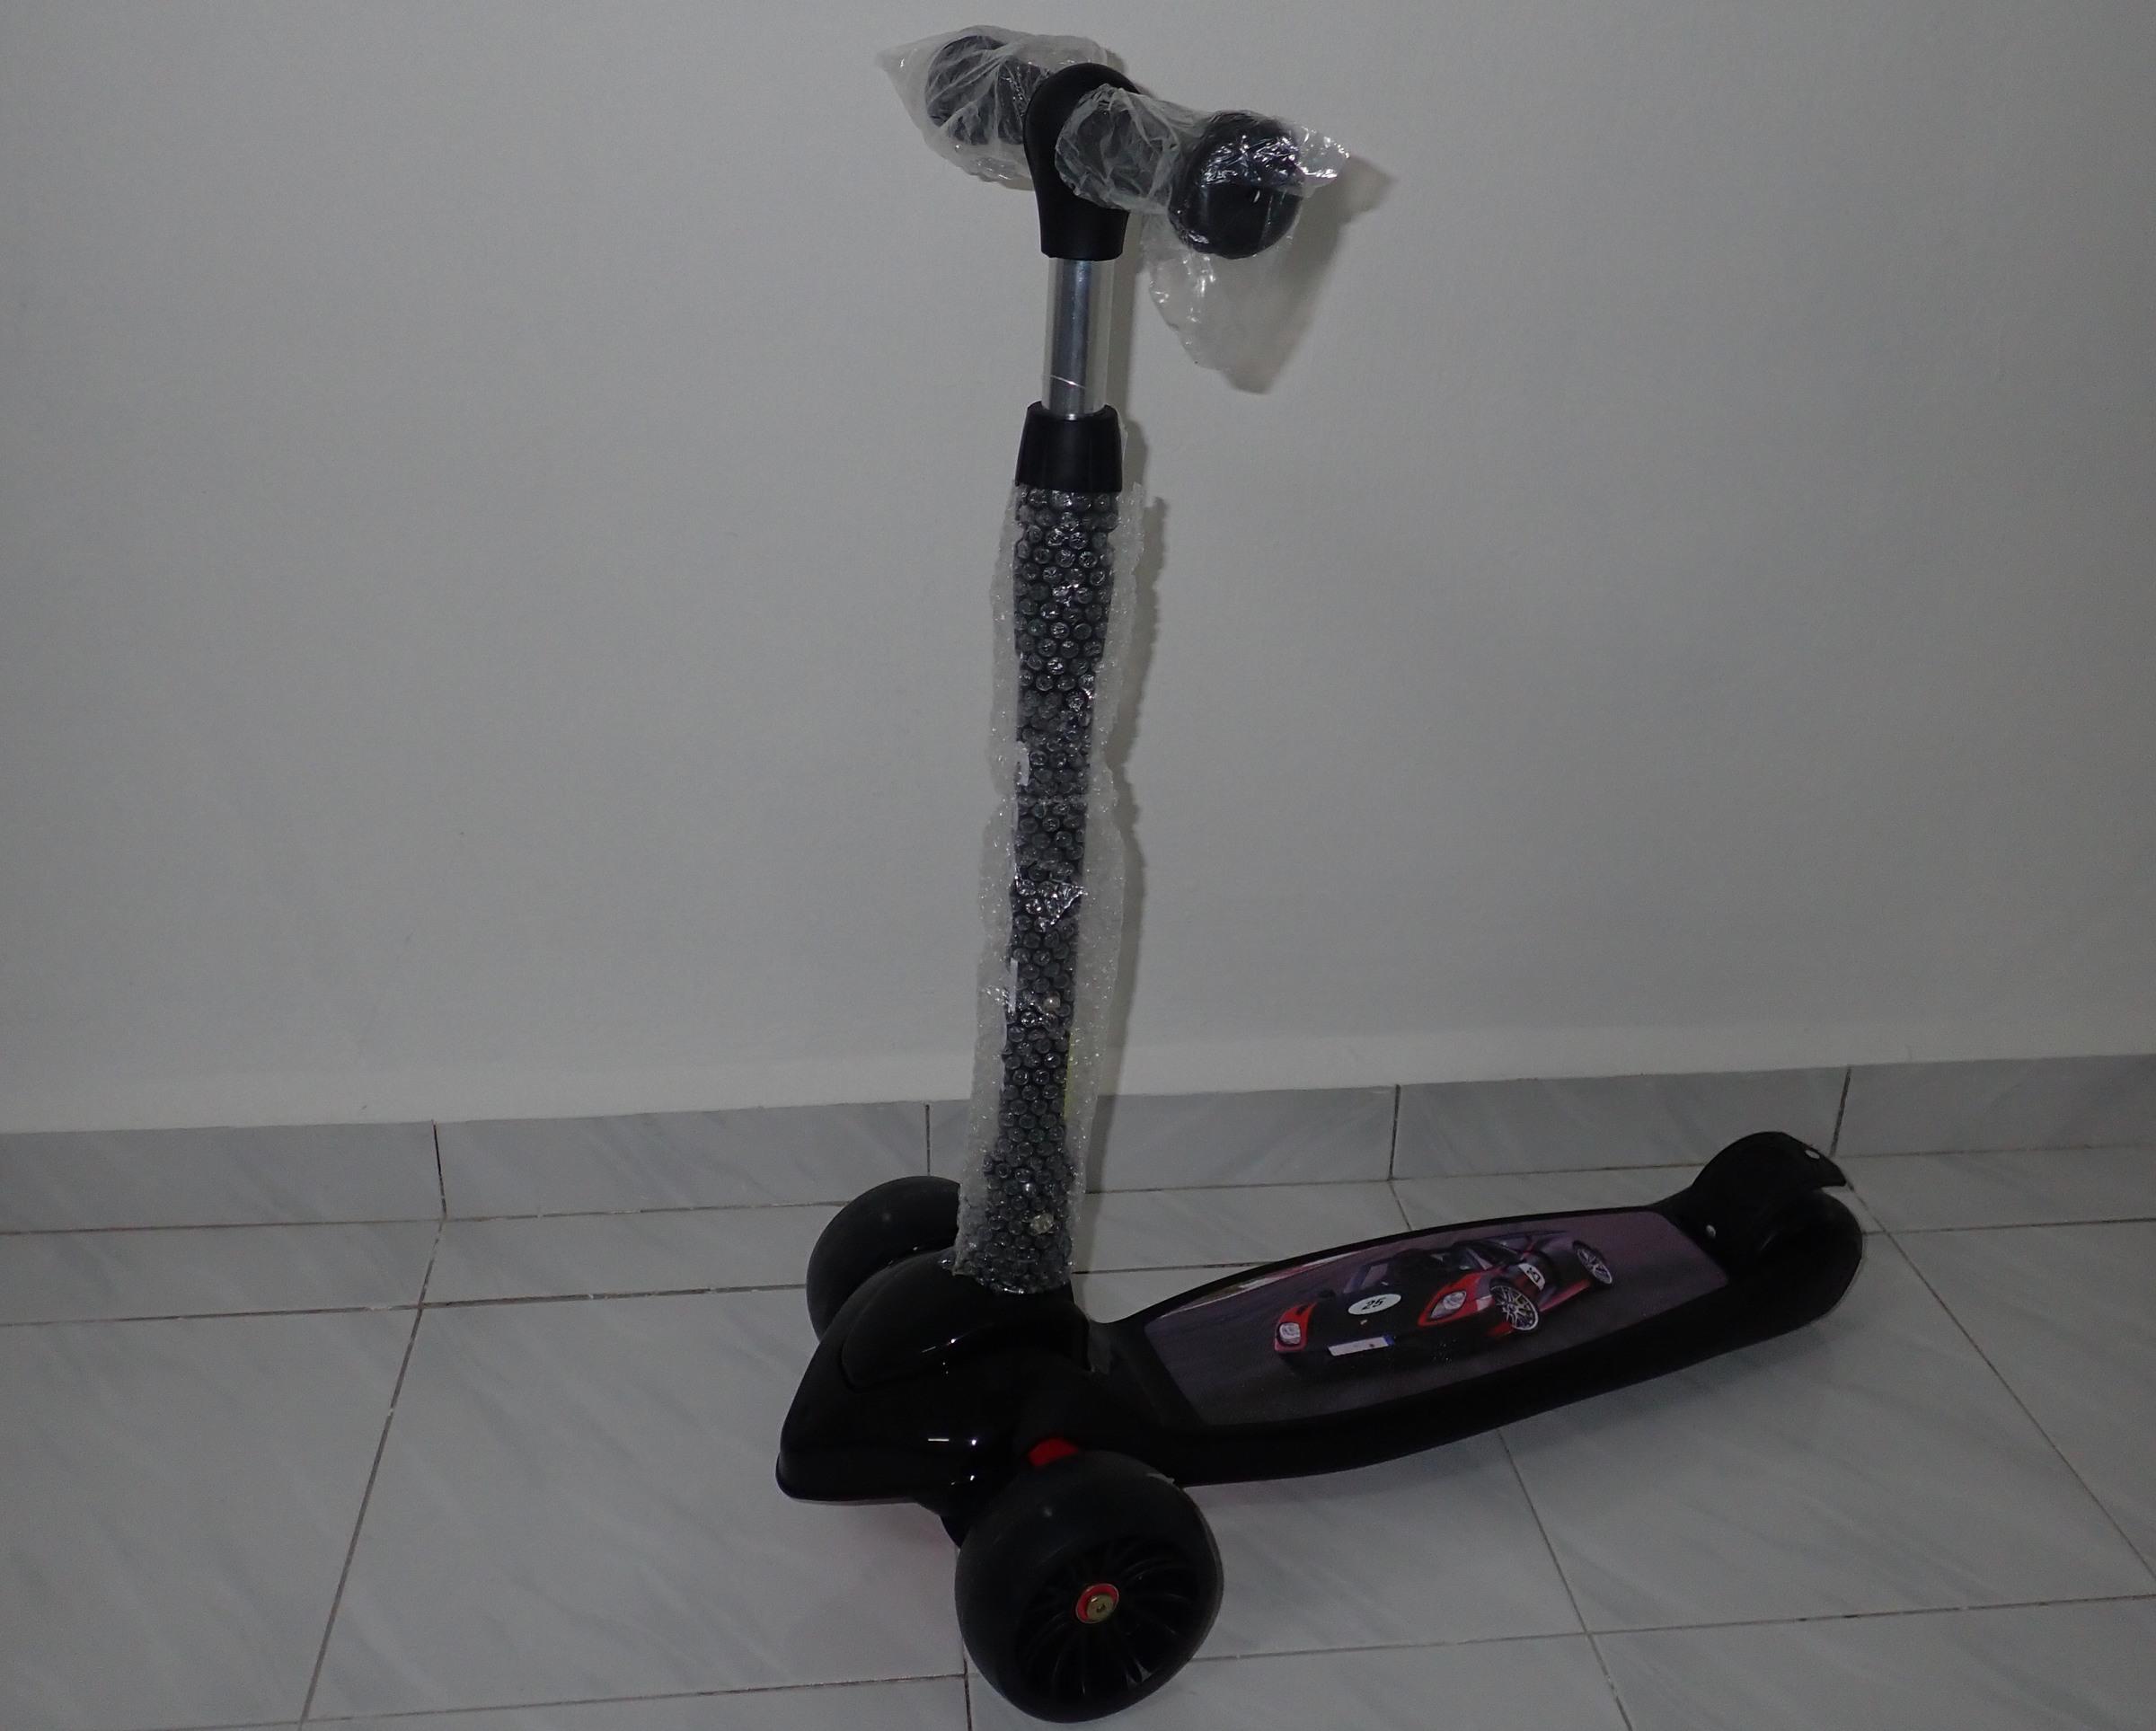 PC301023.JPG